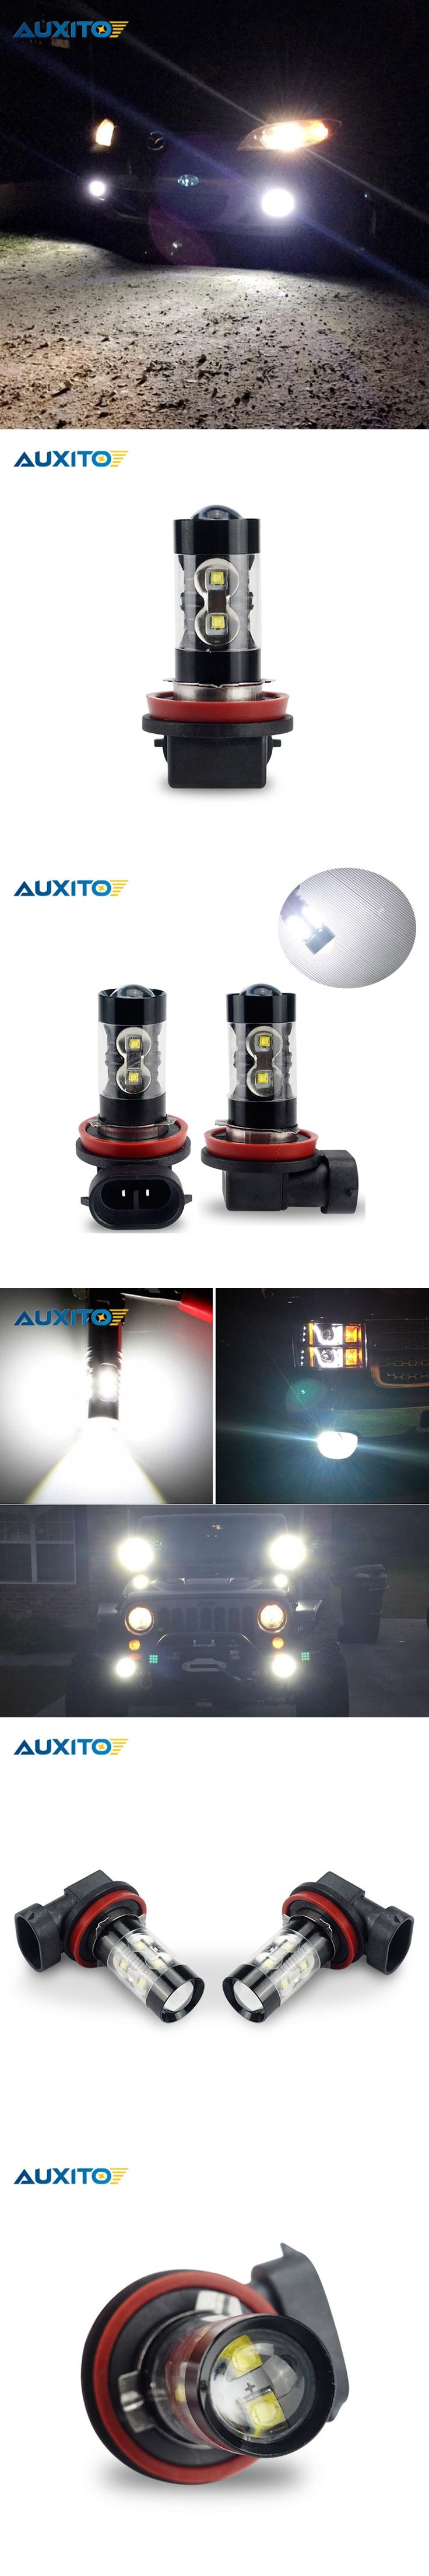 The 33 Best Led Headlight Kits Images On Pinterest Headlights Lamp Lightings Gt Wholesale Lamps 5mm Leds H8 H11 H3 H7 9006 50w Car Fog Light Bulb White Drl For Mercedes W211